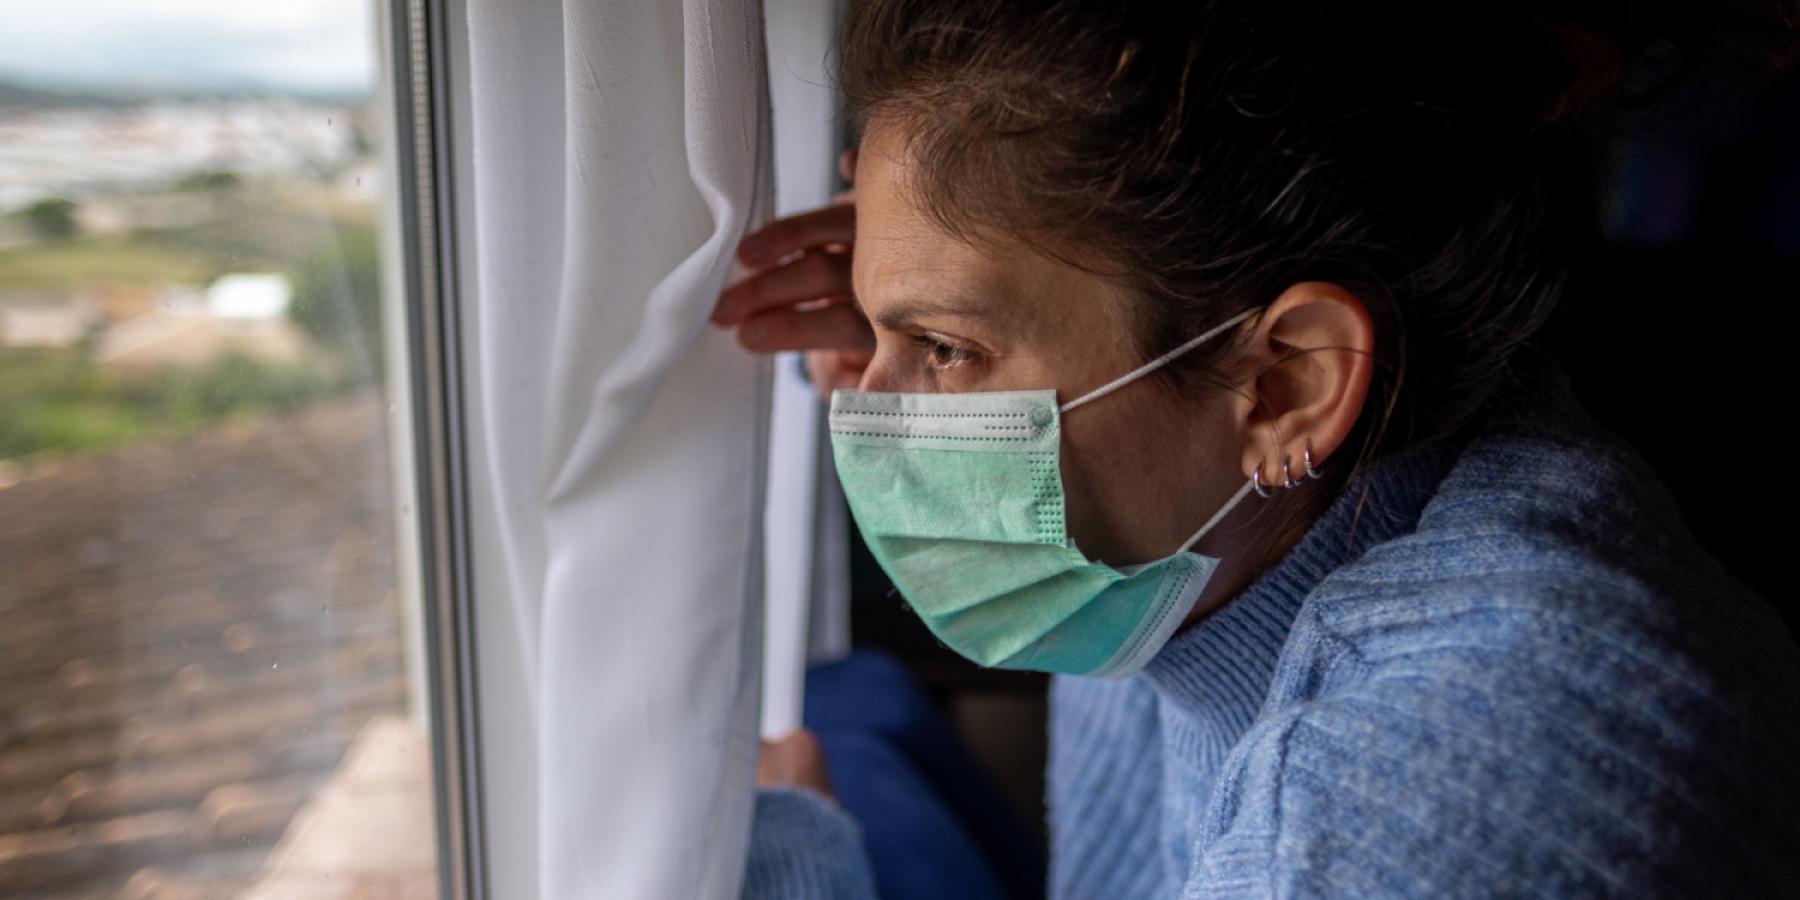 Woman wearing mask. Image by shutterstock